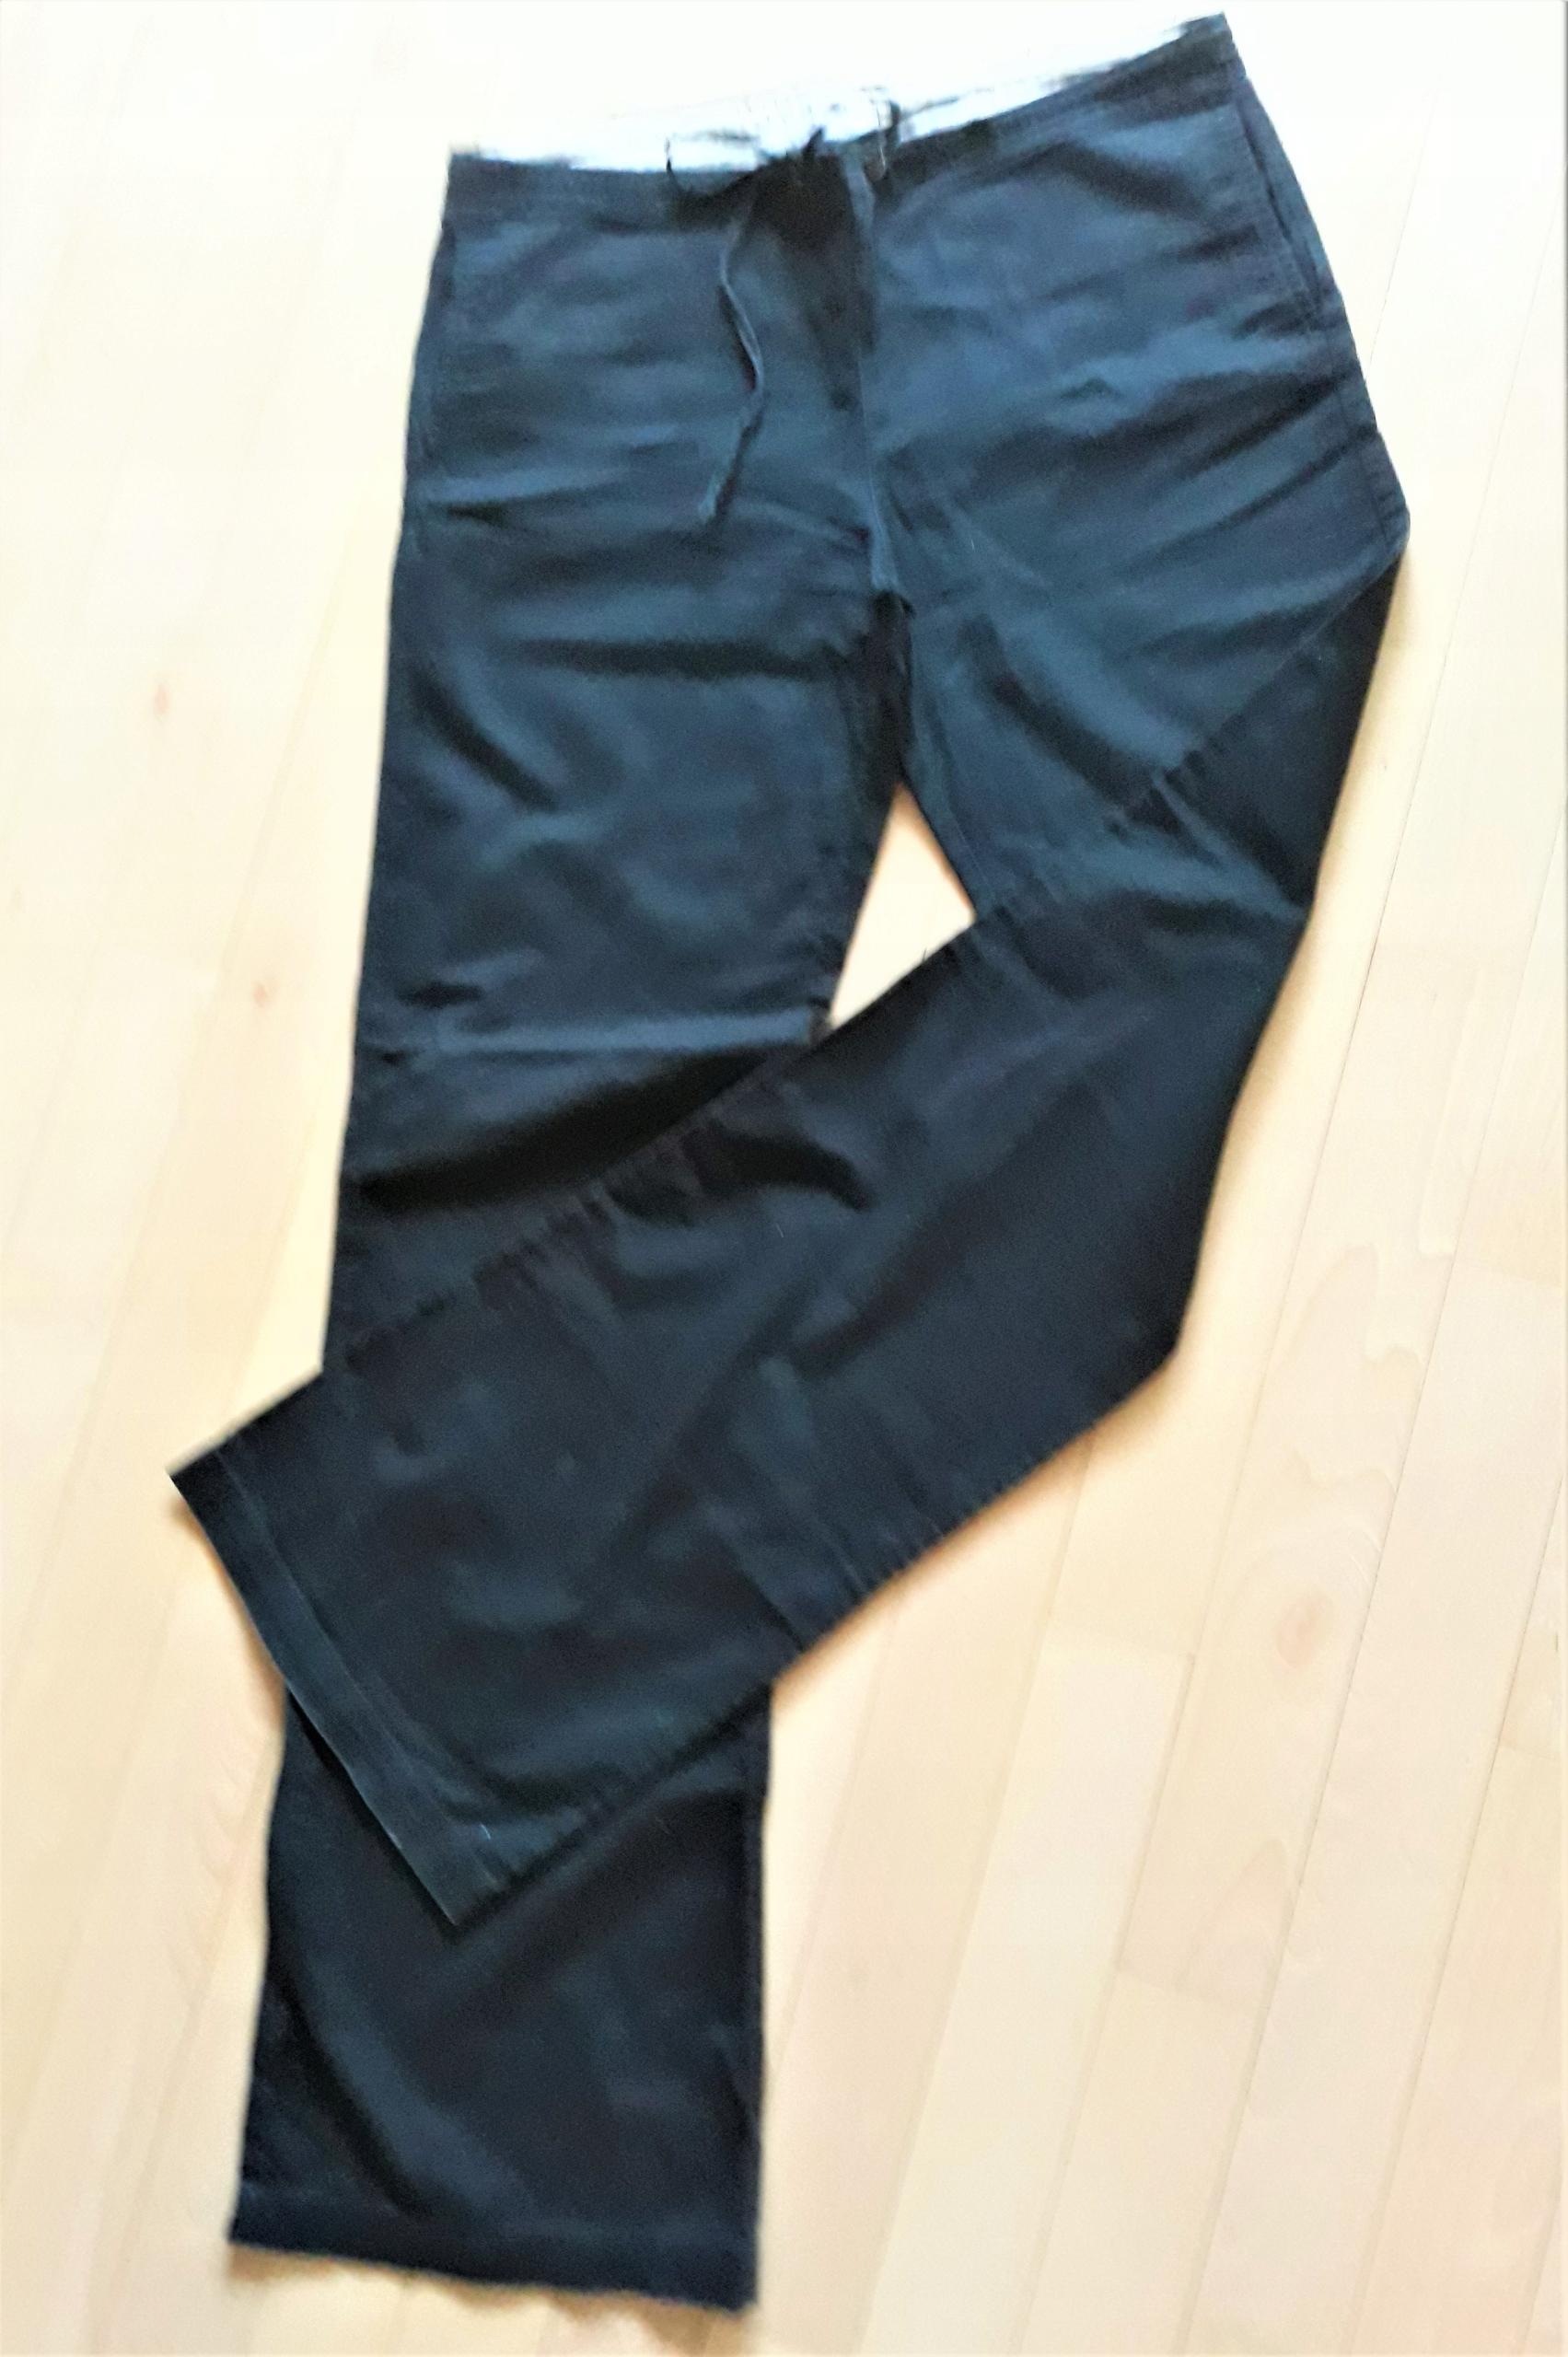 Spodnie Zara 32 M/L